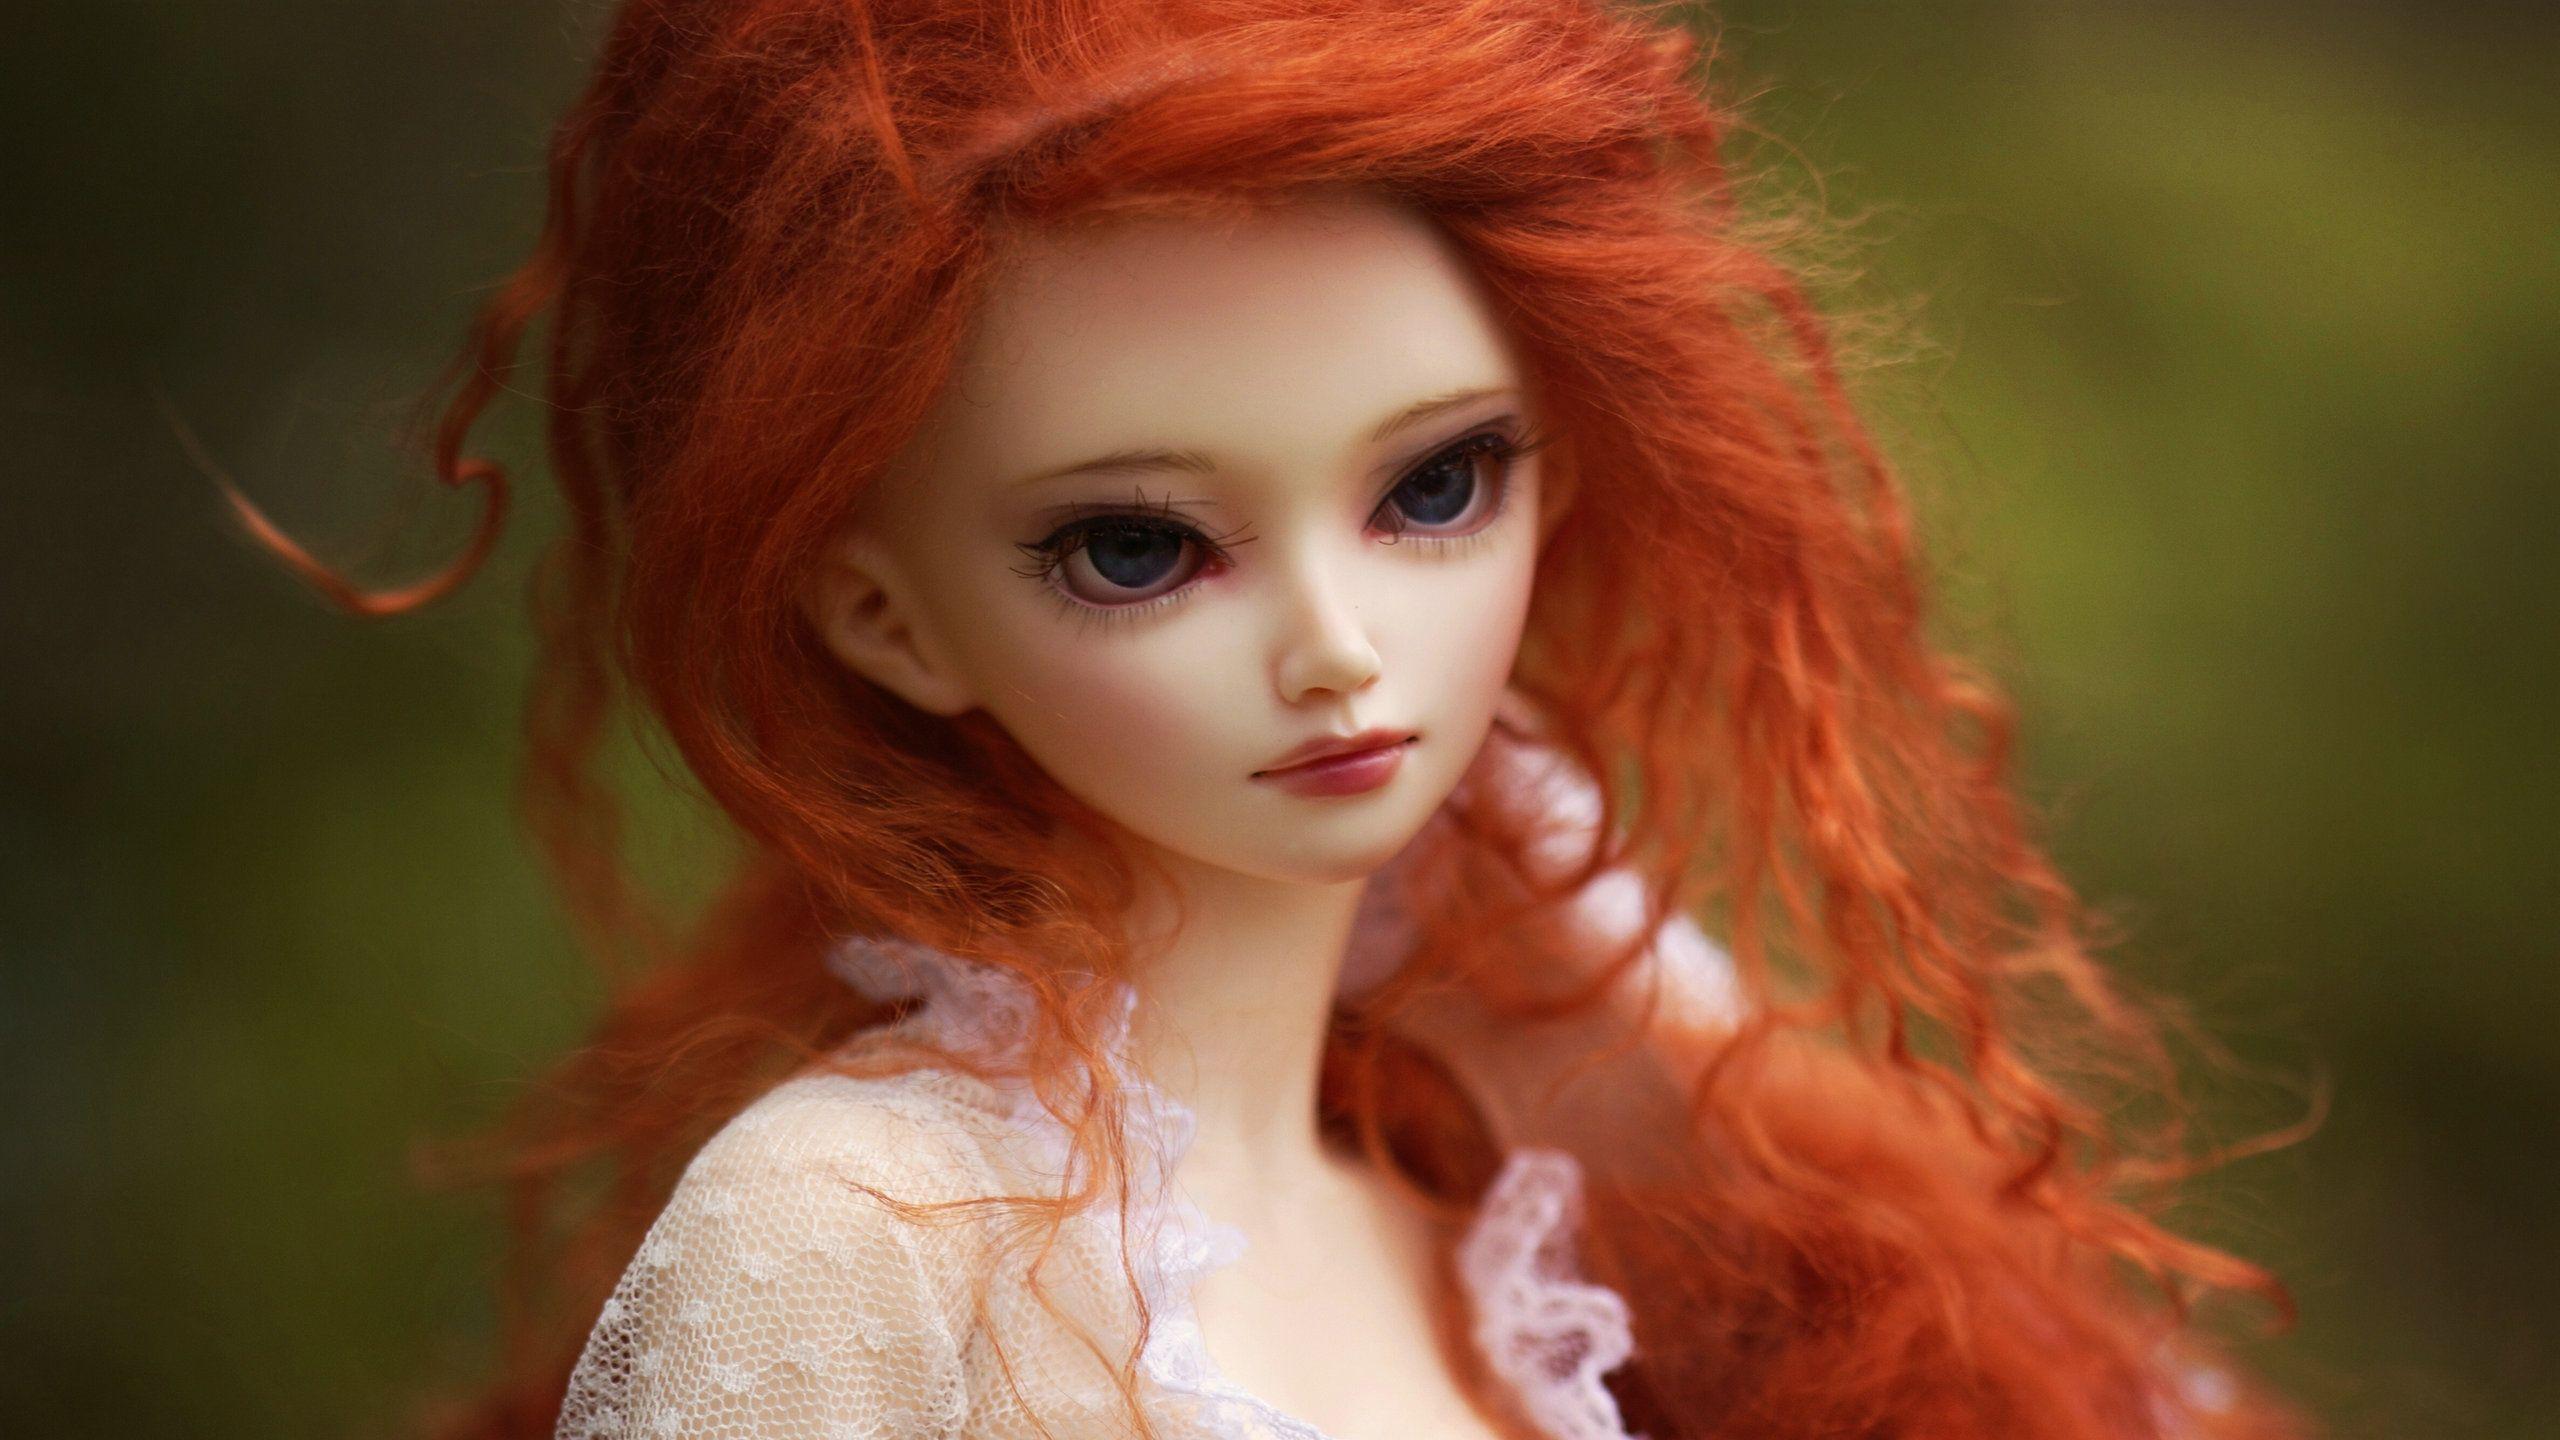 Beautiful Barbie Doll Hd Images Barbie Dolls Beautiful Dolls